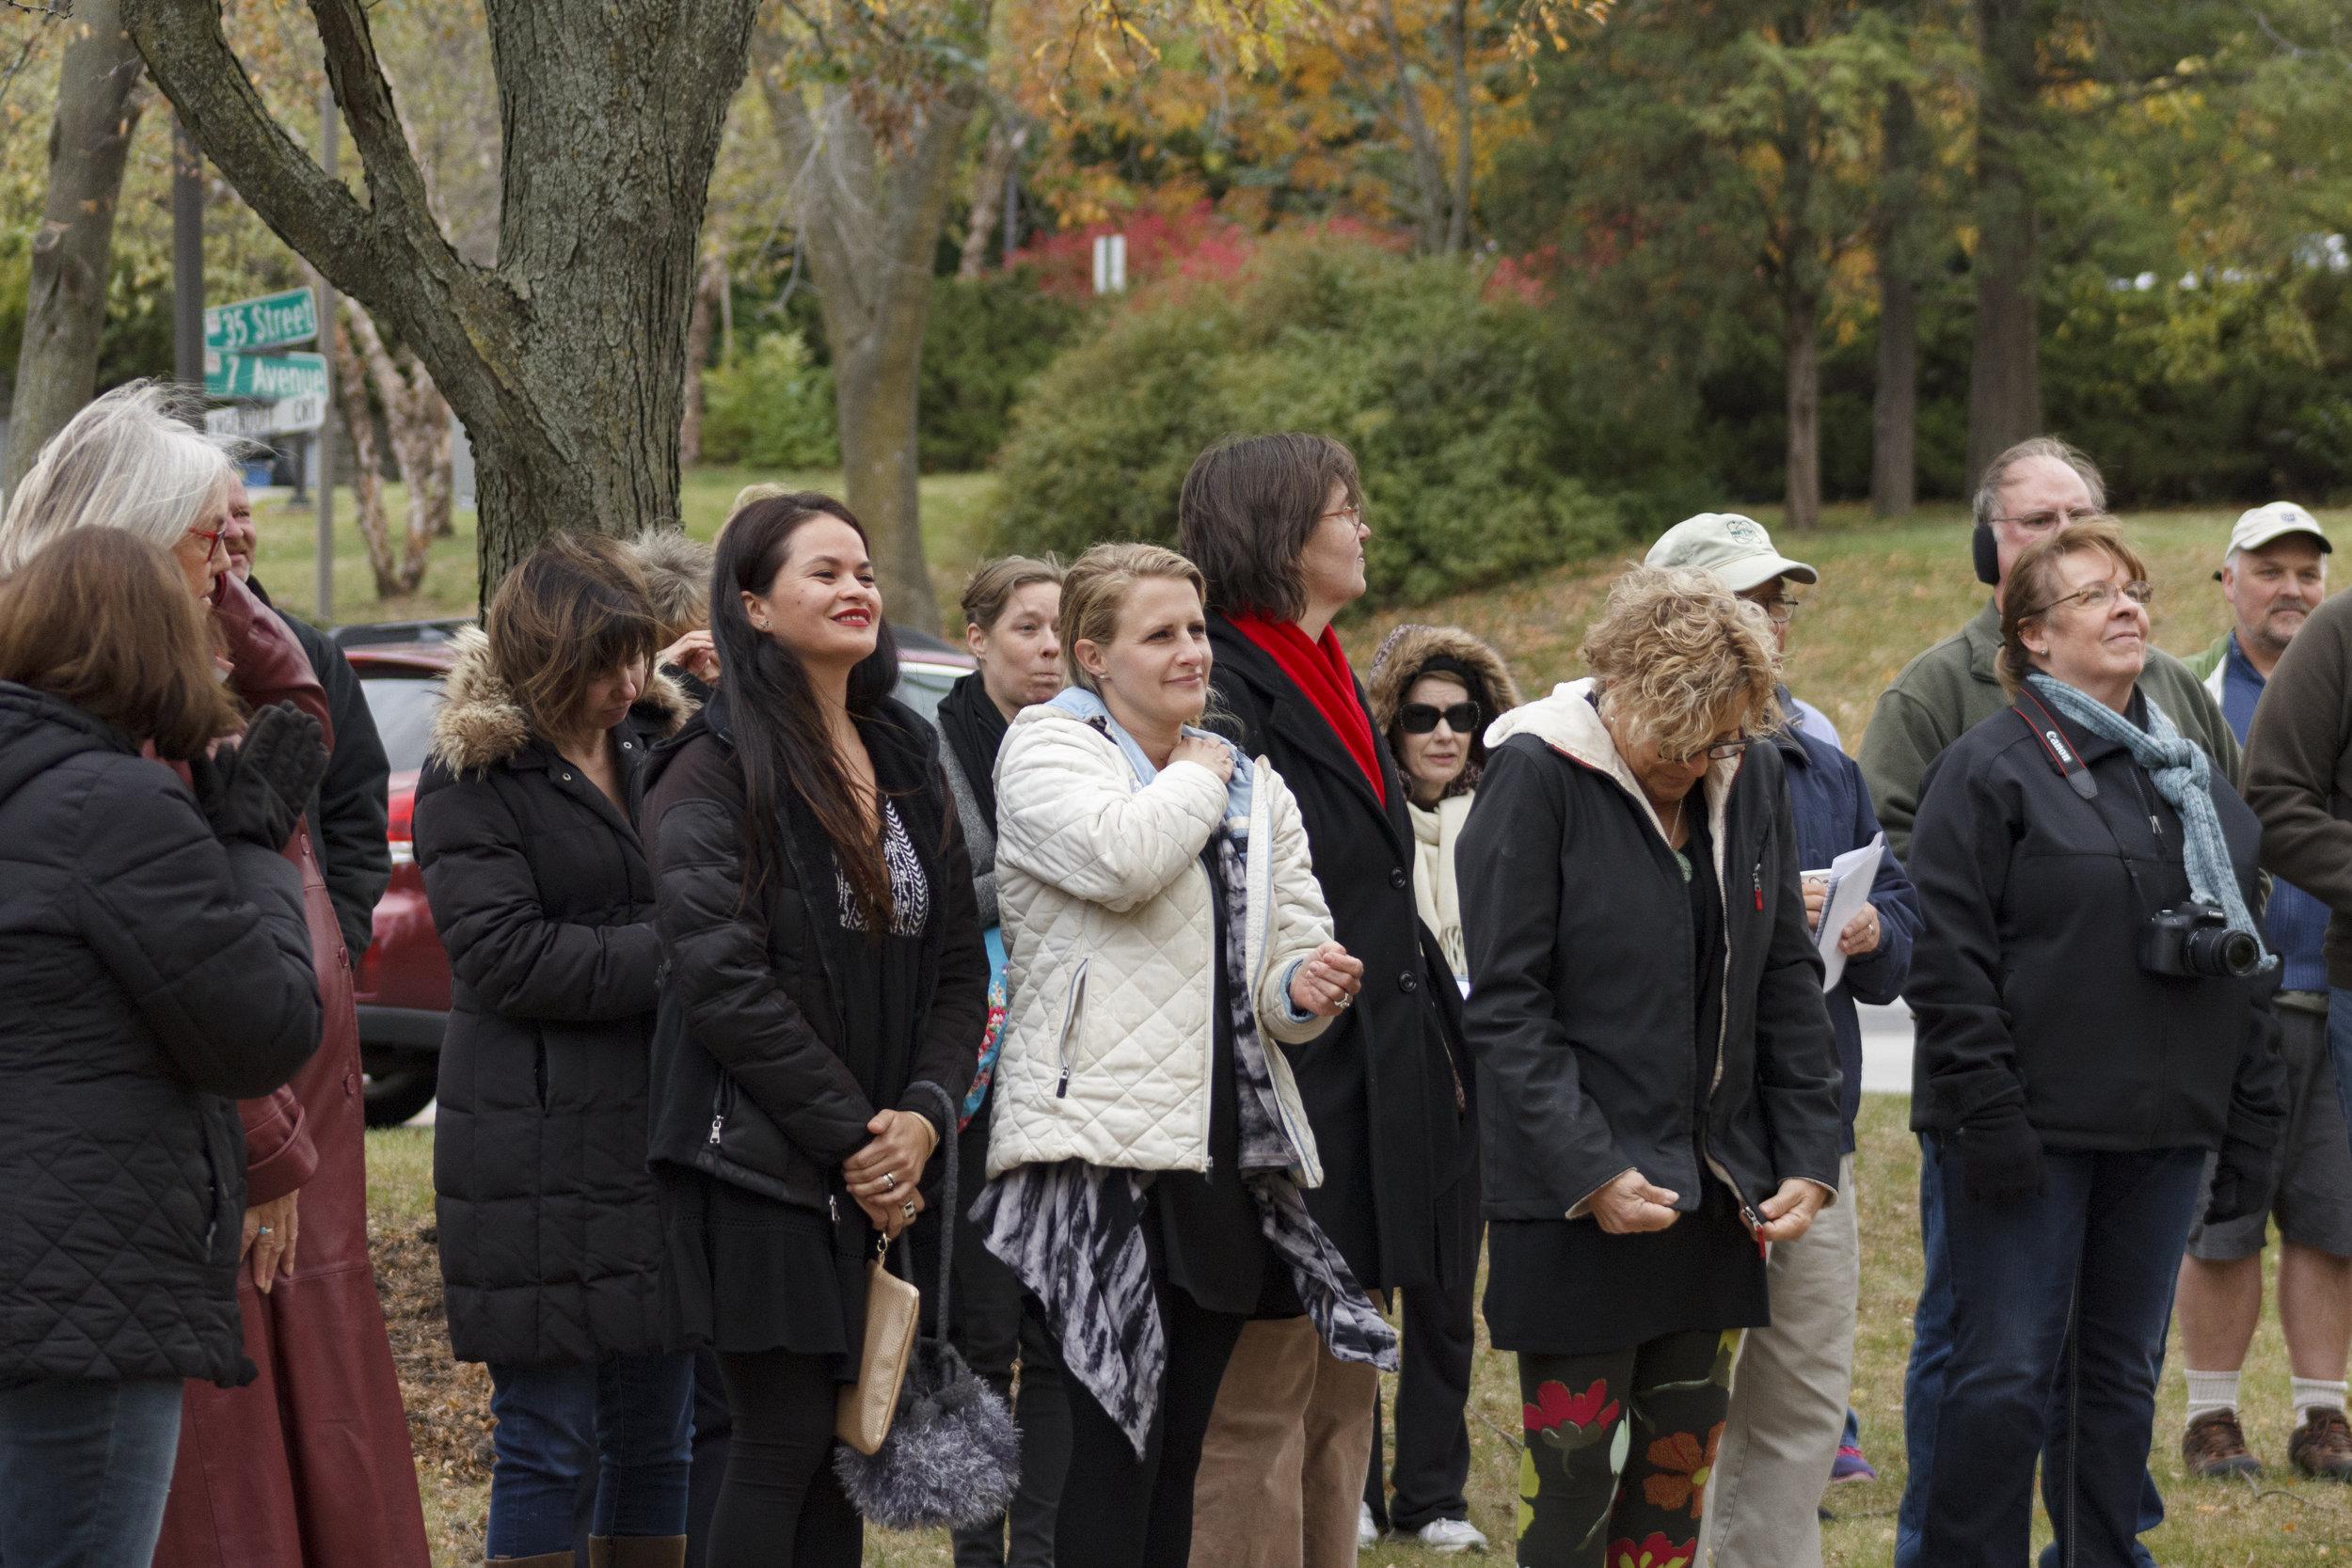 Unveiling reception (photo courtesy of LuAnna Gerdemann)